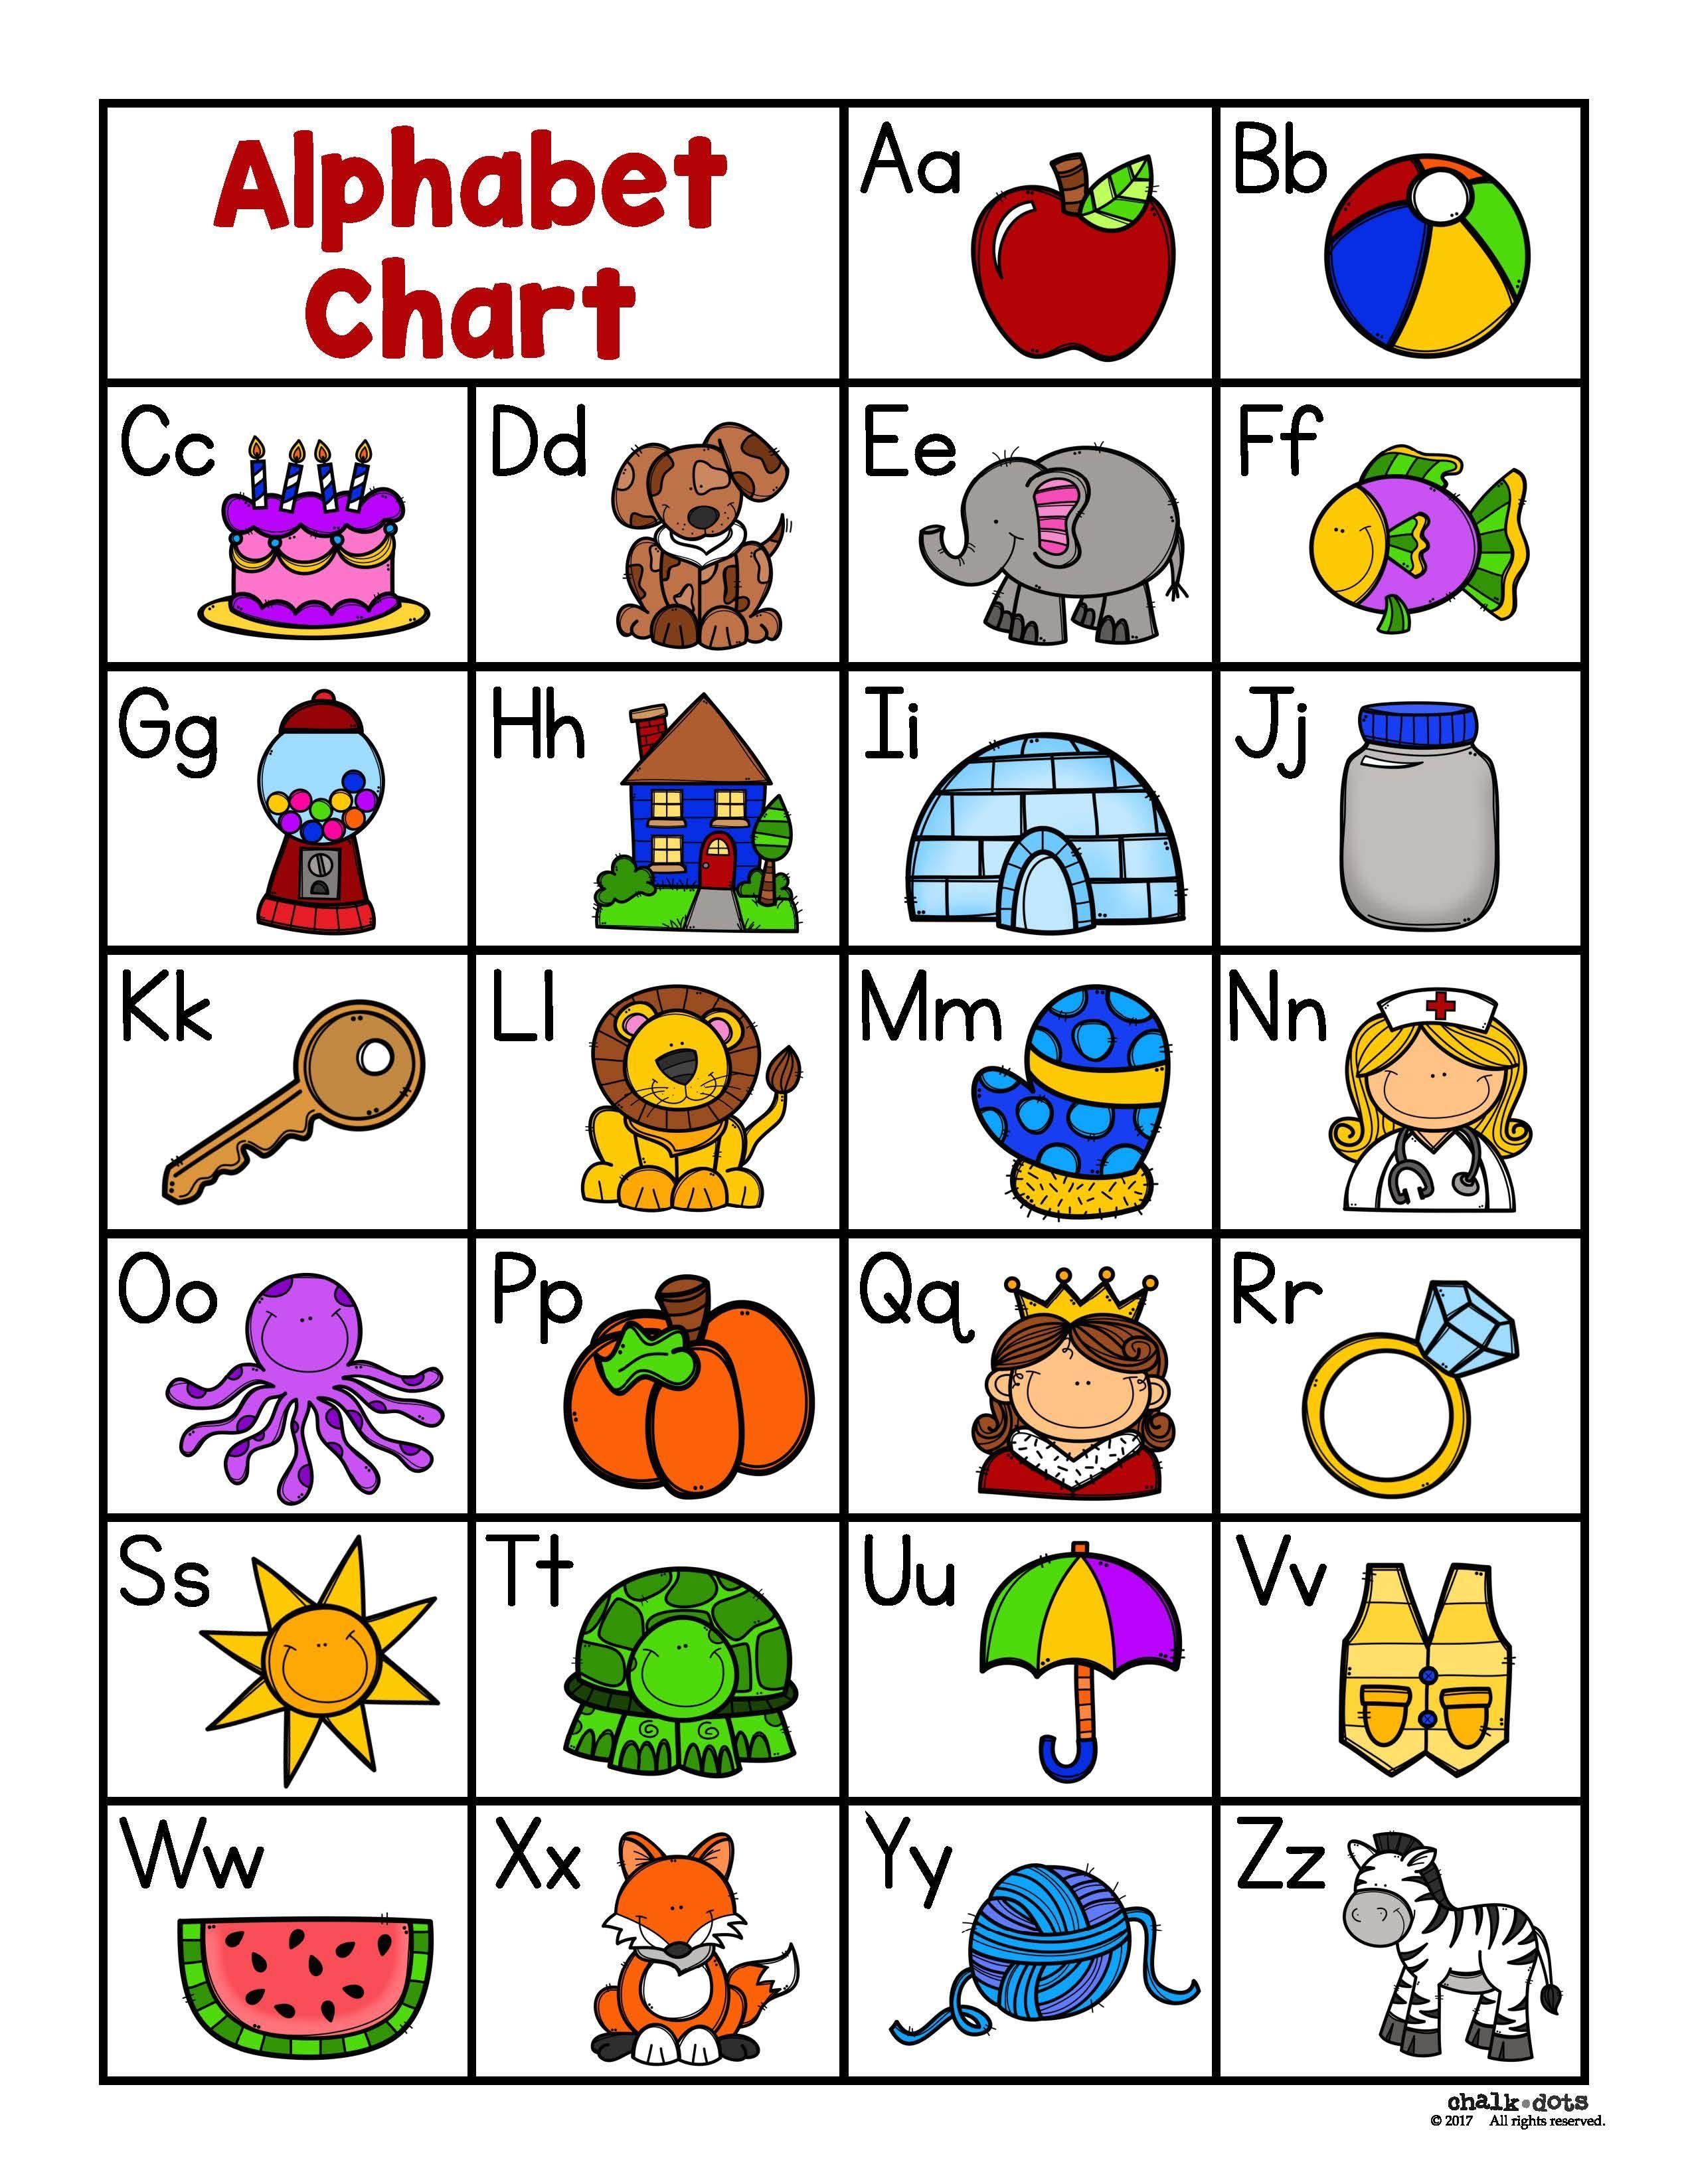 Alphabet Chart | Alphabet preschool, Alphabet charts ...